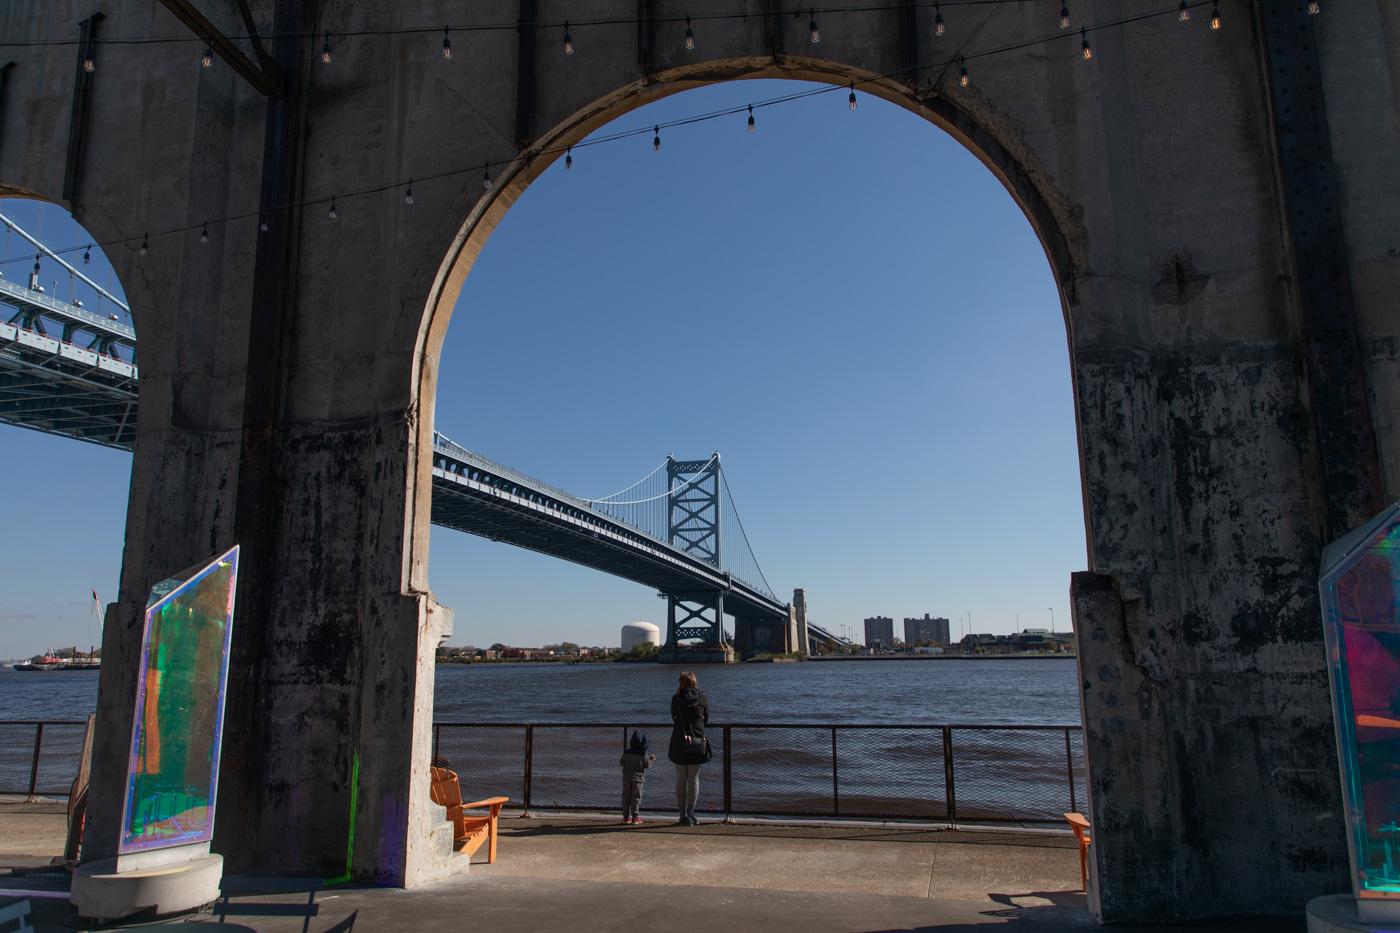 Benjamin Franklin Bridge as Seen from Cherry Street Pier